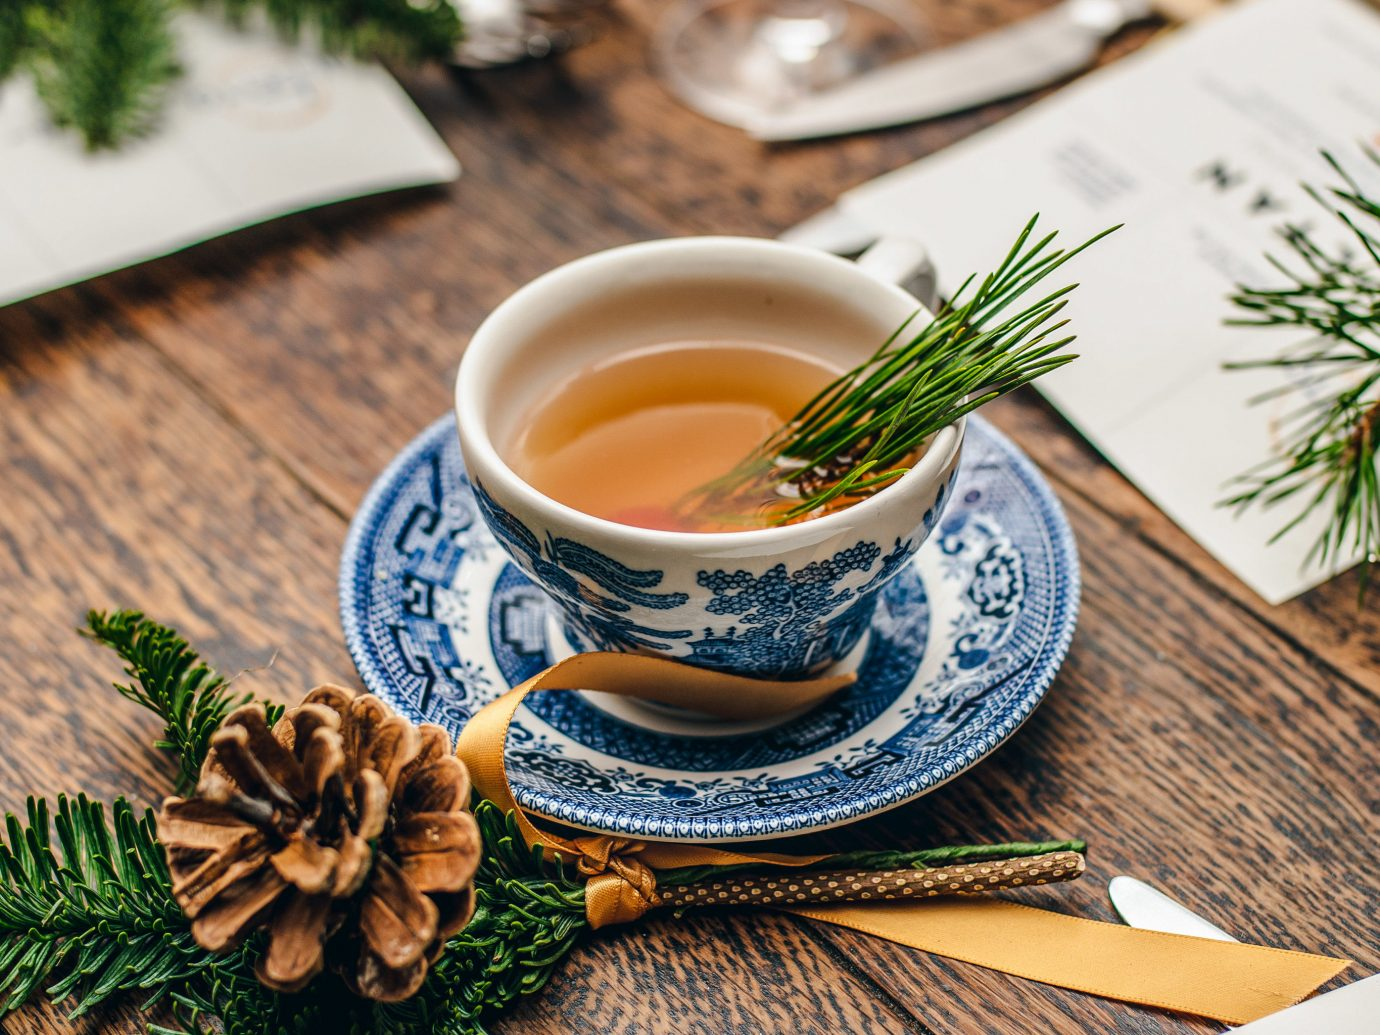 Food + Drink Trip Ideas table coffee plate cup tableware tea coffee cup plant earl grey tea flavor meal